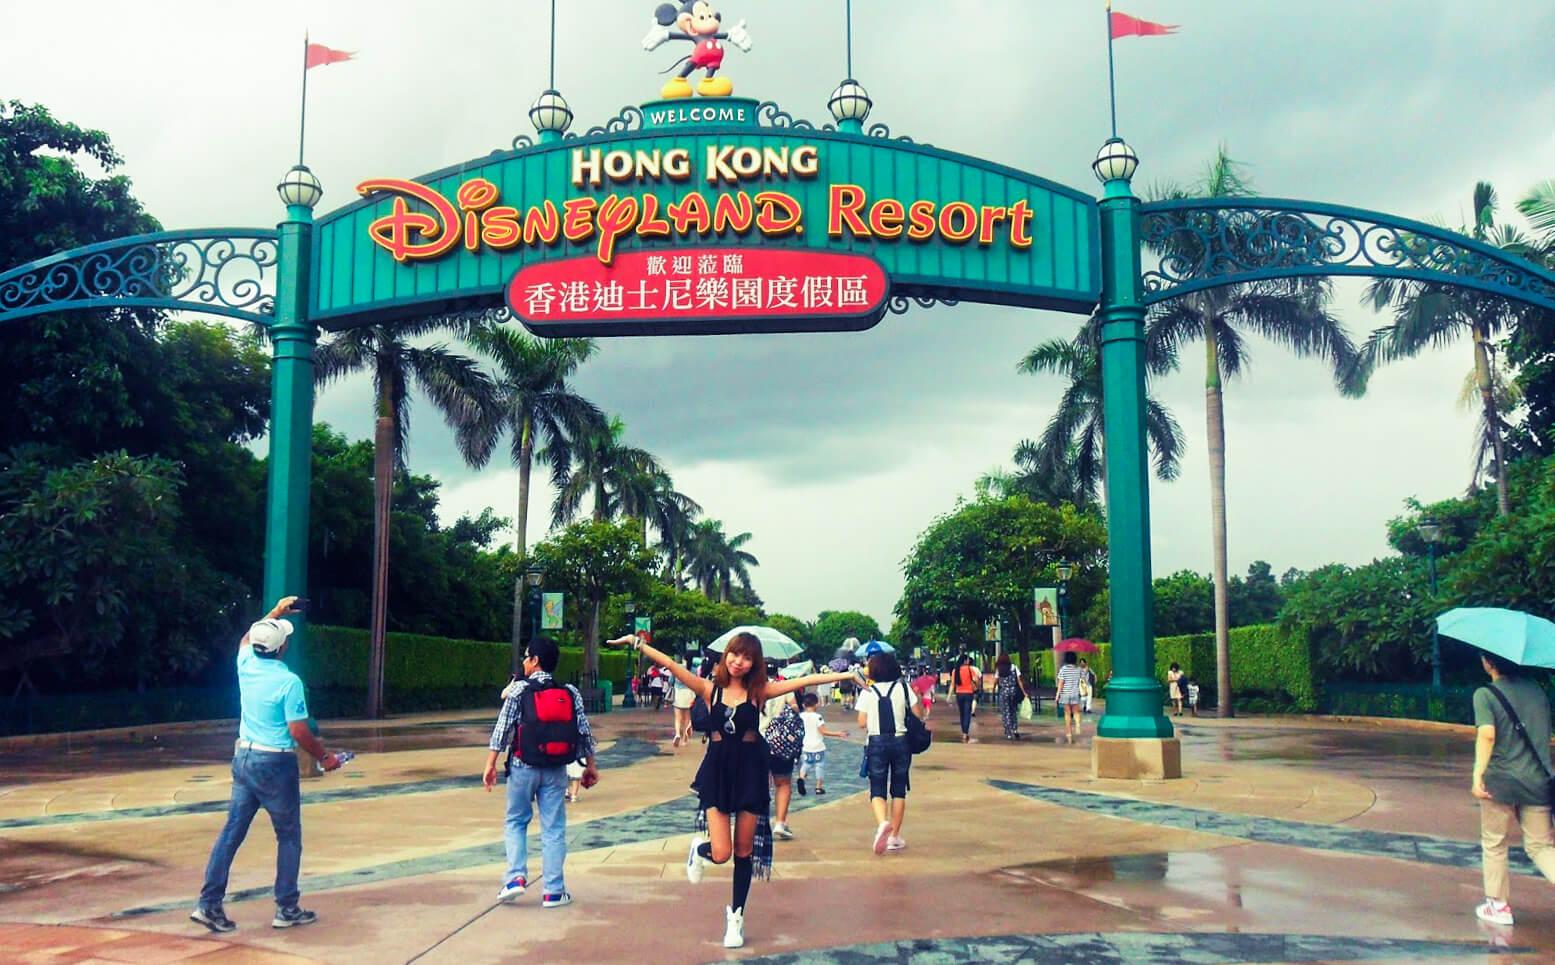 hongkong-disneyland-entrance-1.jpg